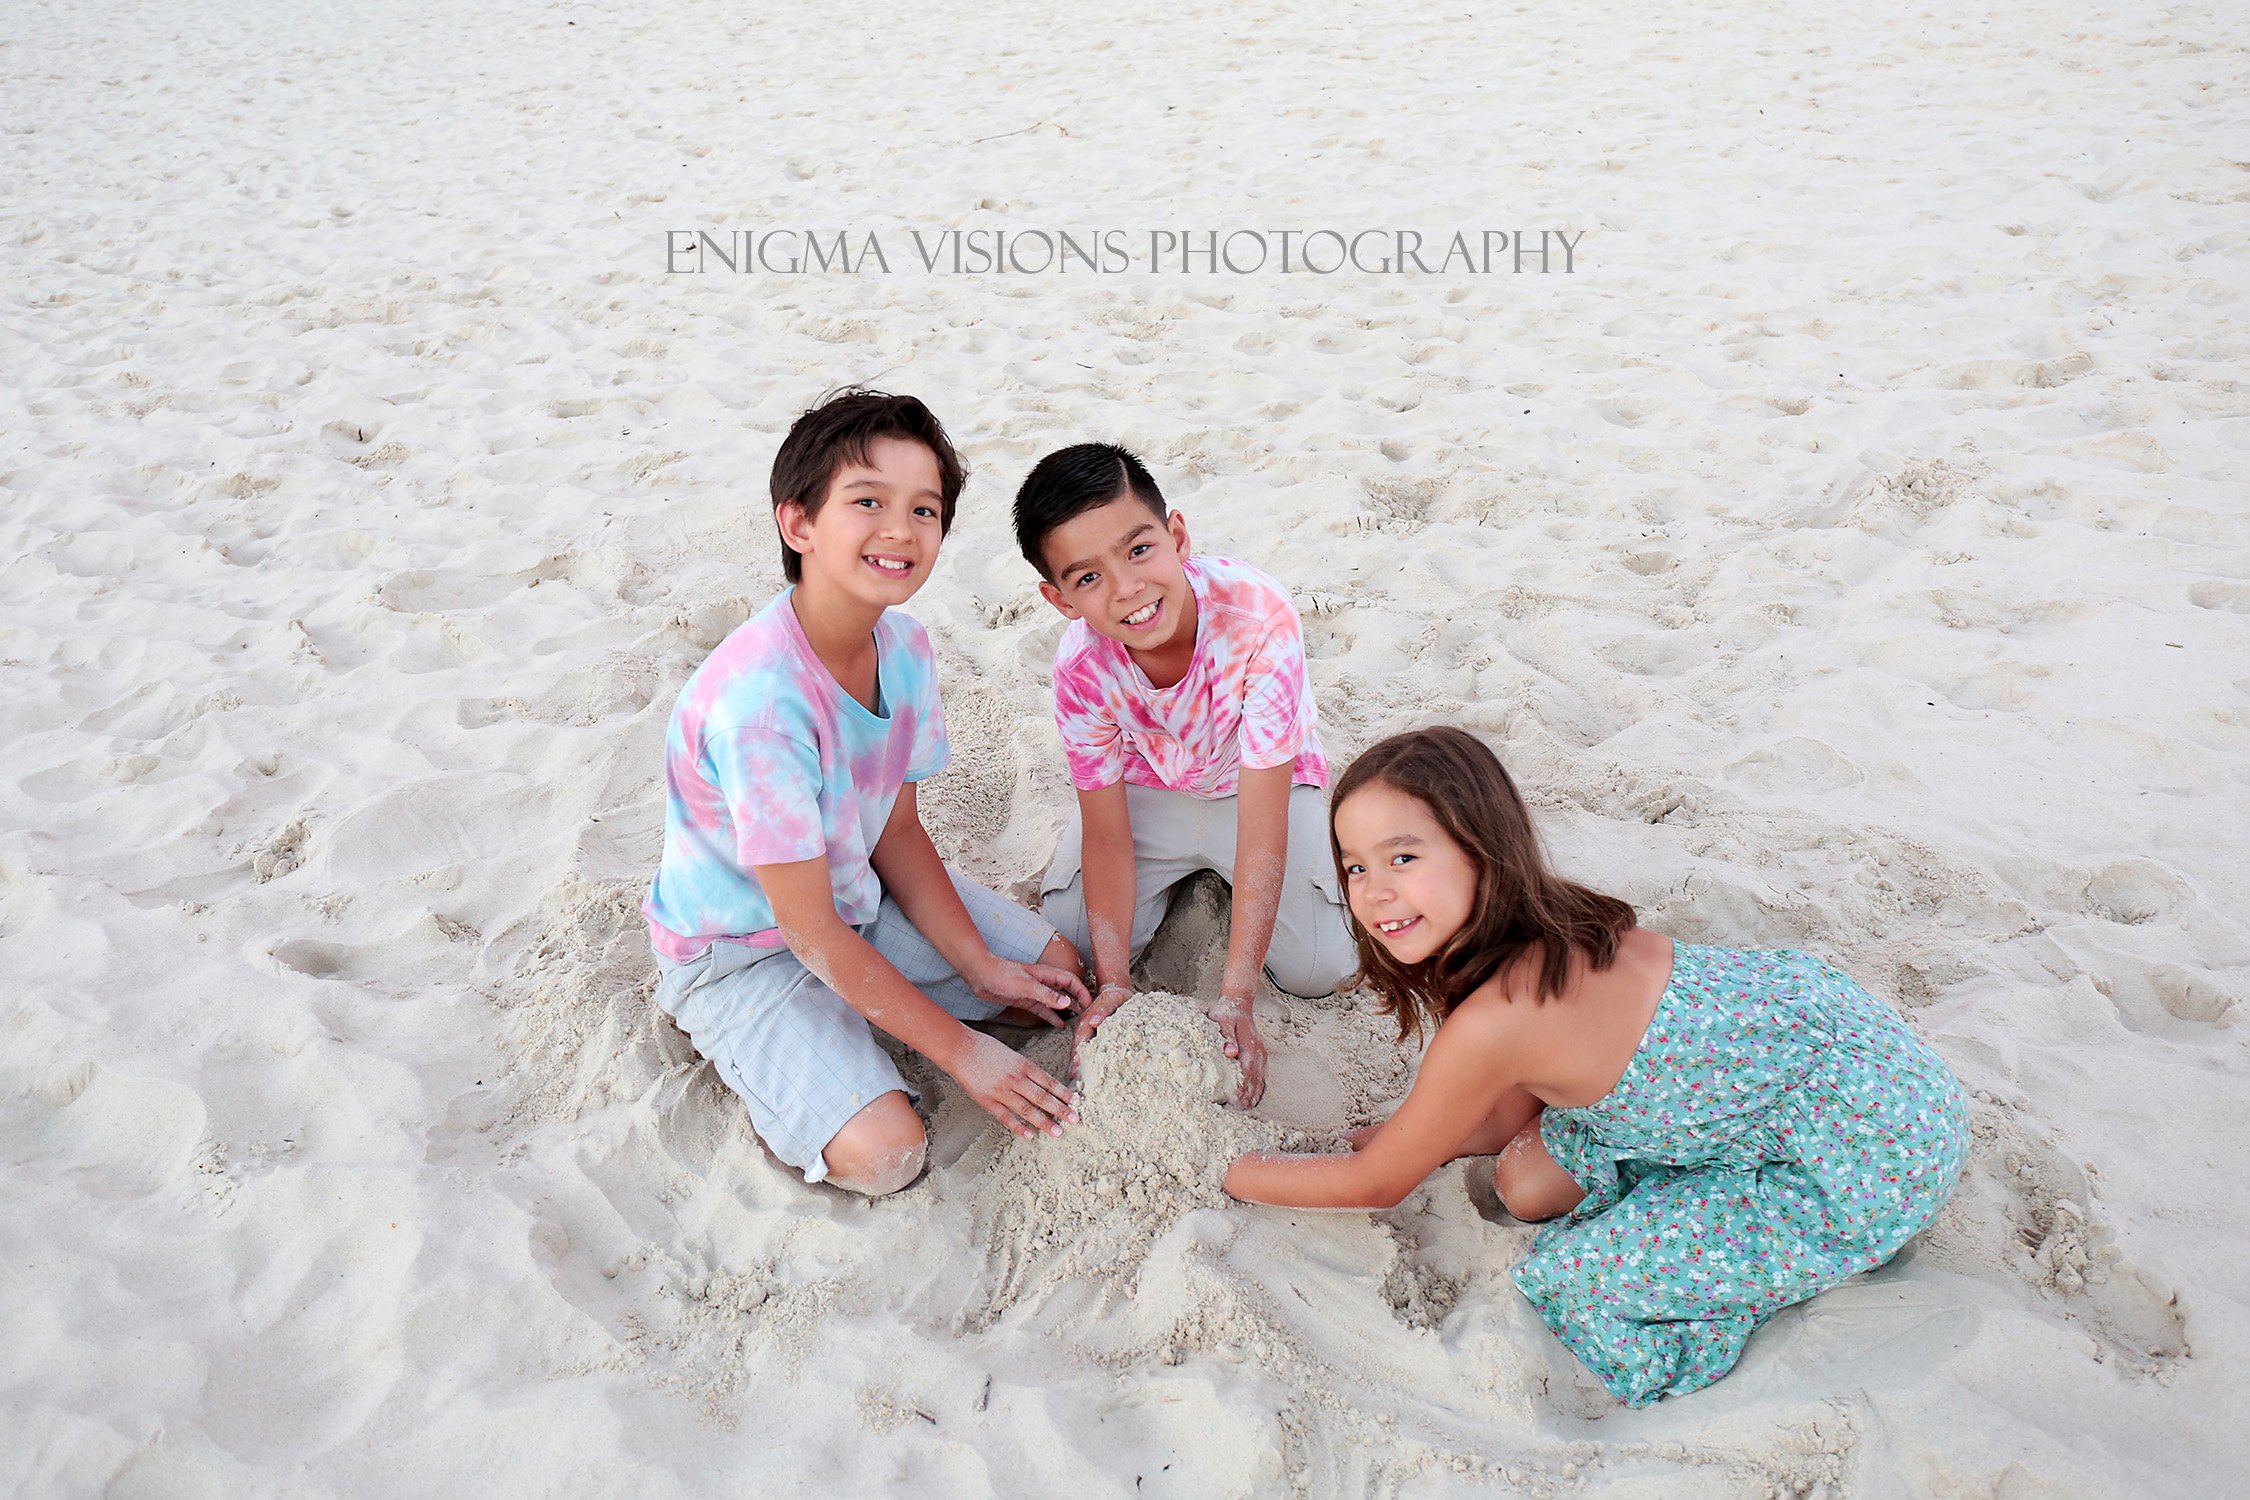 EnigmaVisionsPhotography_FAMILY_Sarah (11).jpg